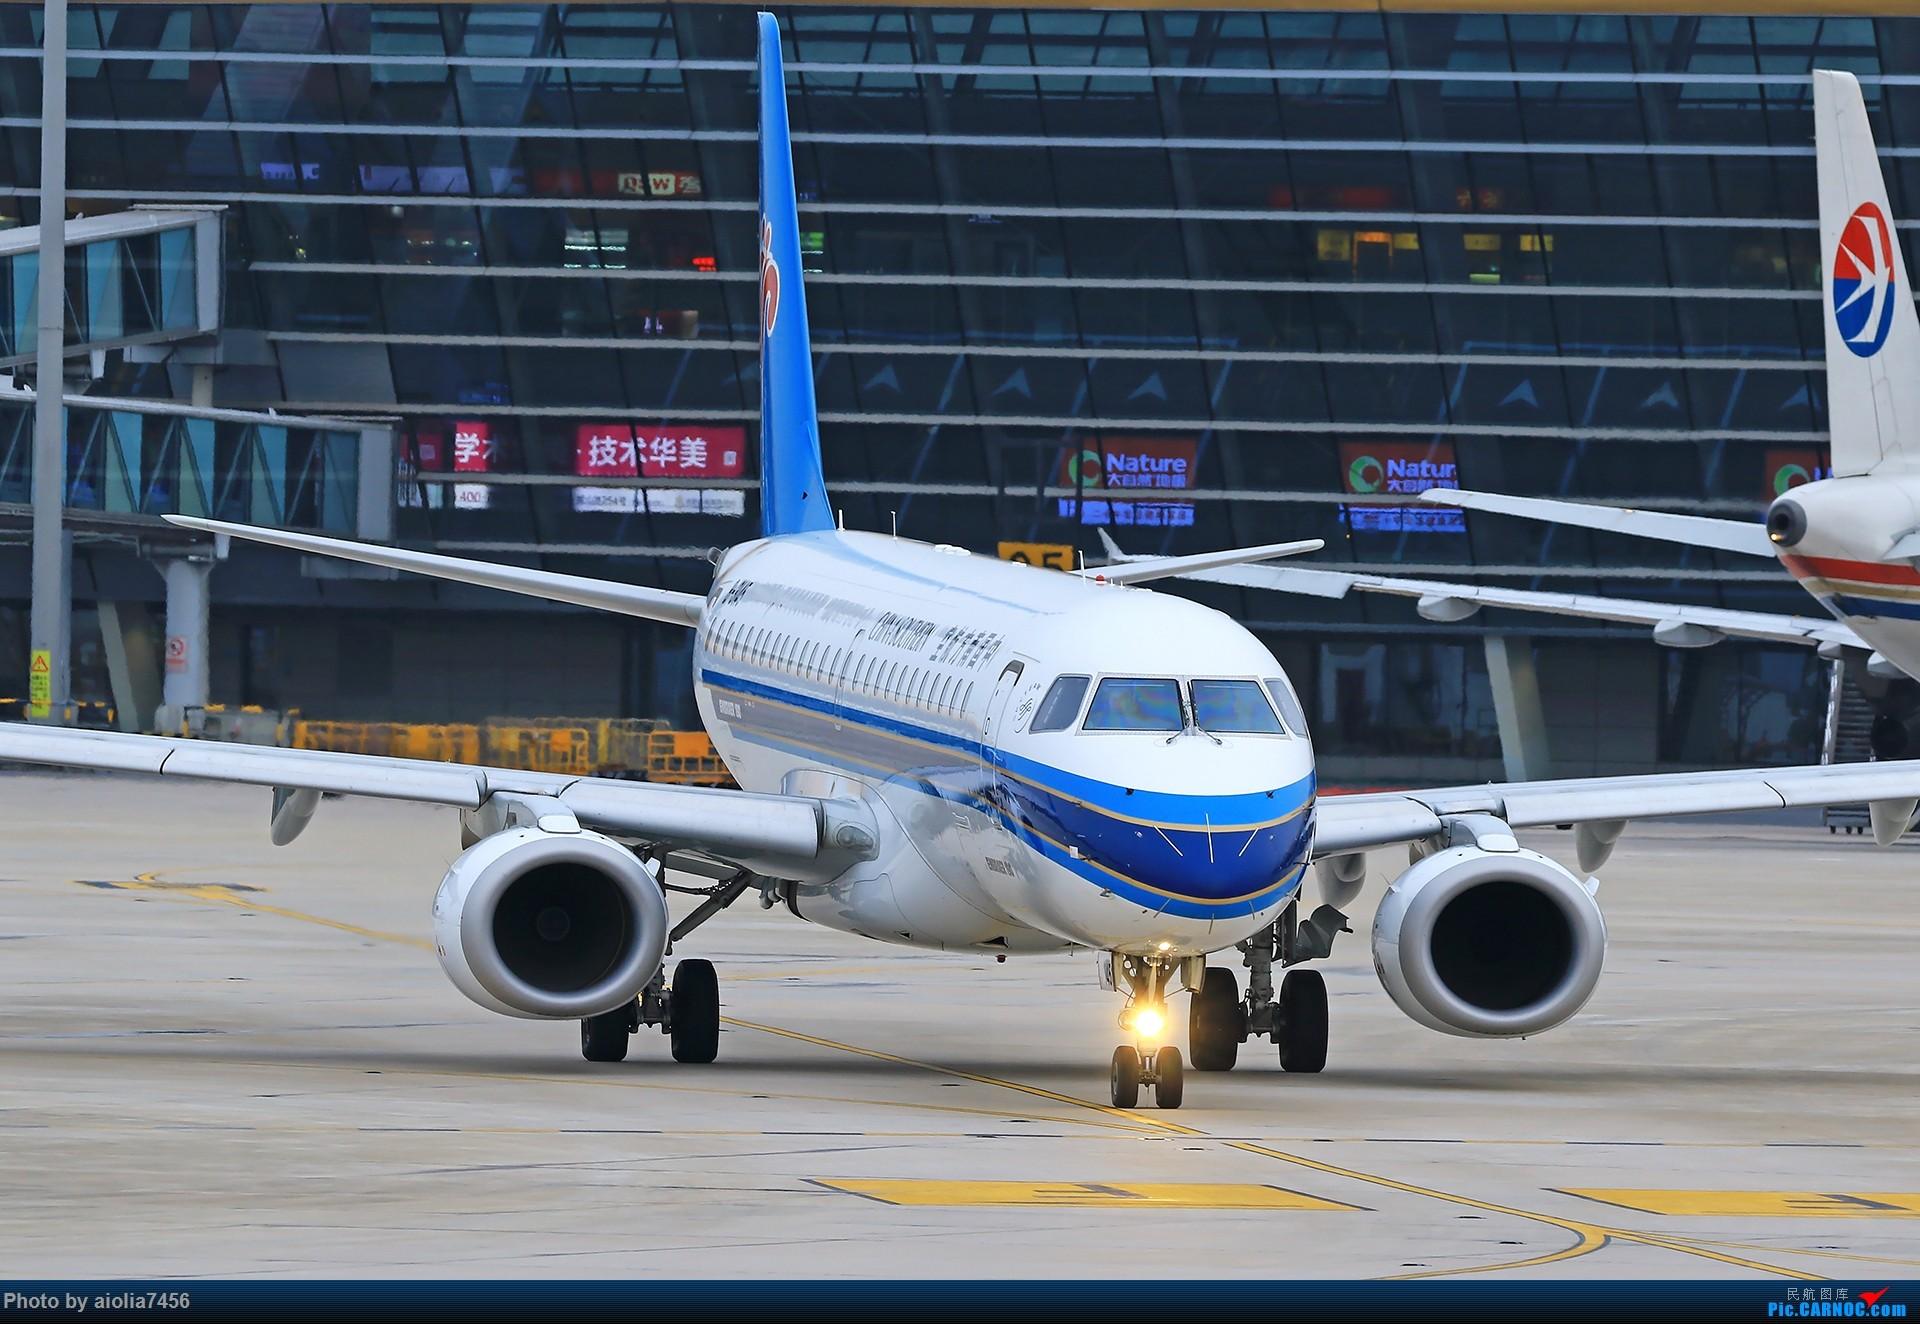 Re:[原创][合肥飞友会]霸都打鸡 找个机会白天打华航 顺便看看期待已久的迪斯尼 EMBRAER E-190 B-3145 中国合肥新桥国际机场